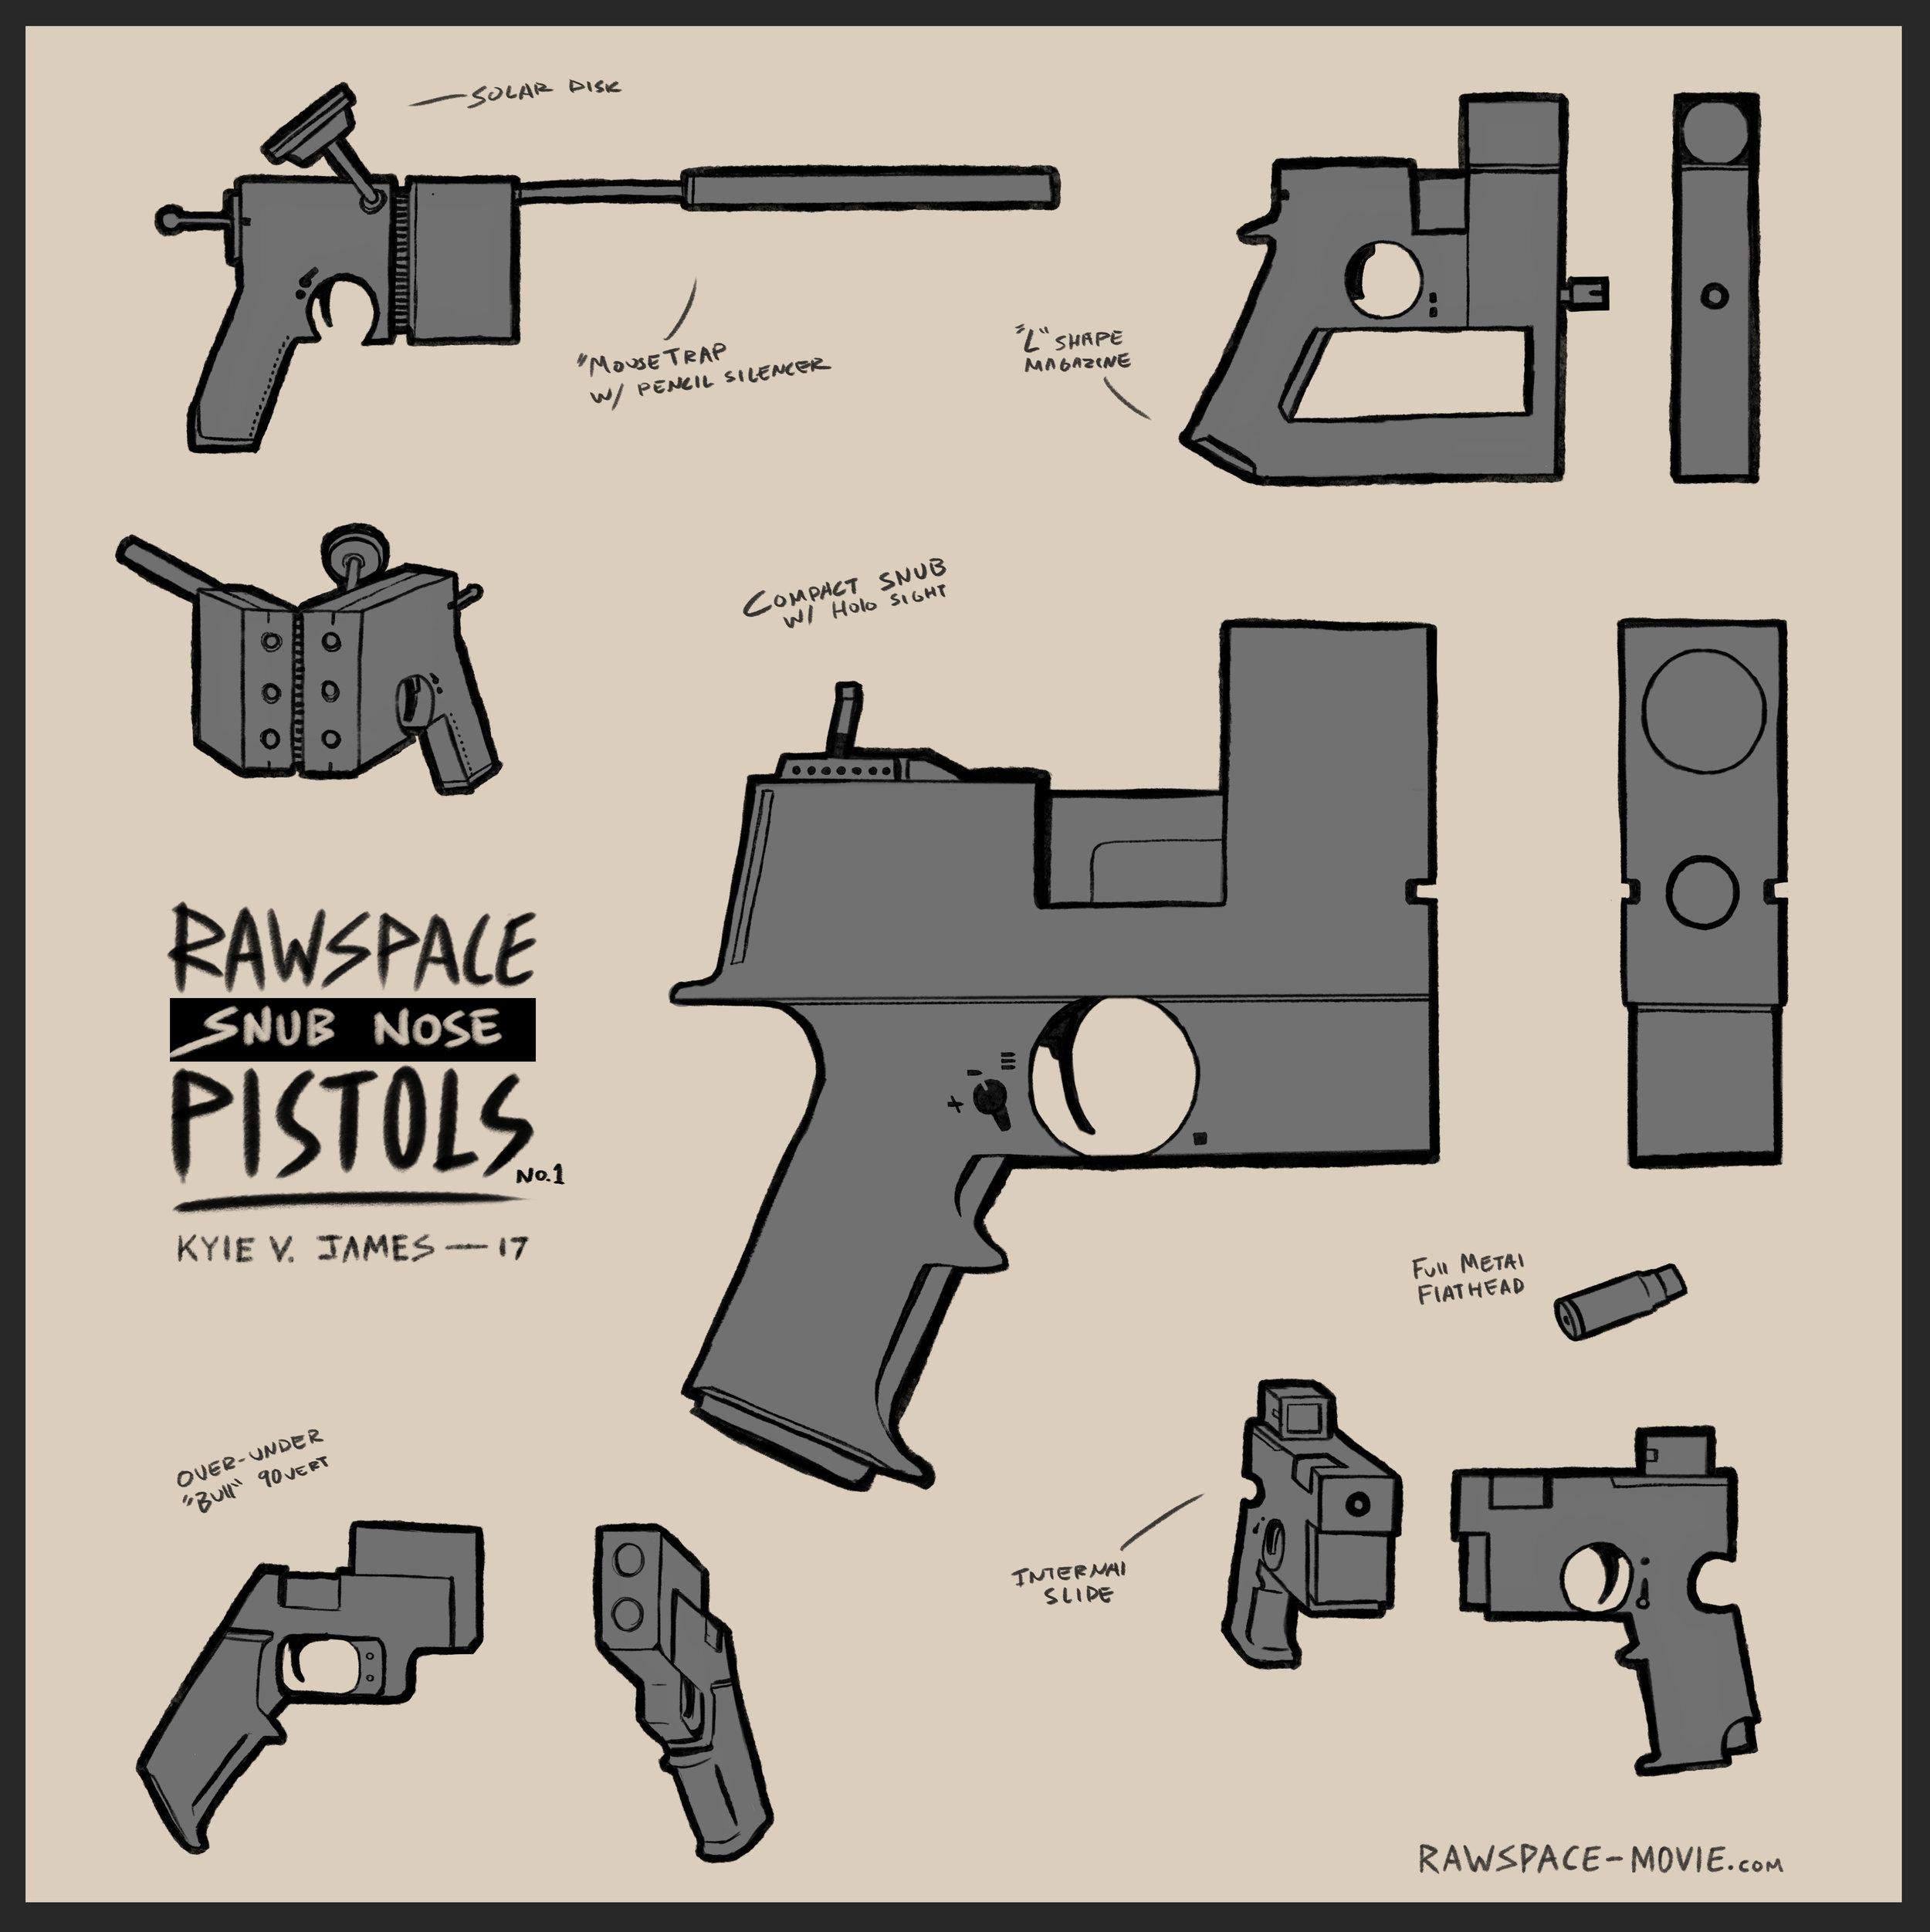 17-7-27 pistols sketchbook3.jpg